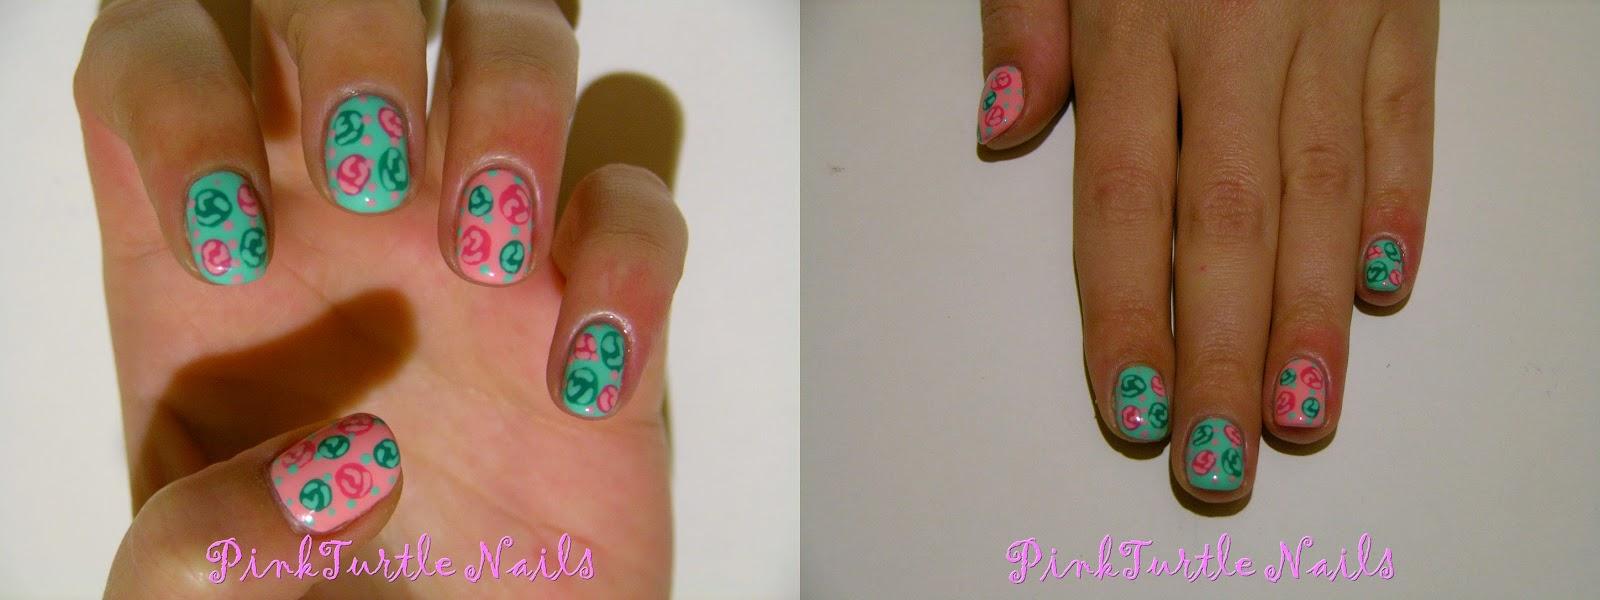 http://pinkturtlenails.blogspot.com.es/2015/03/reto-31-dias-flores.html